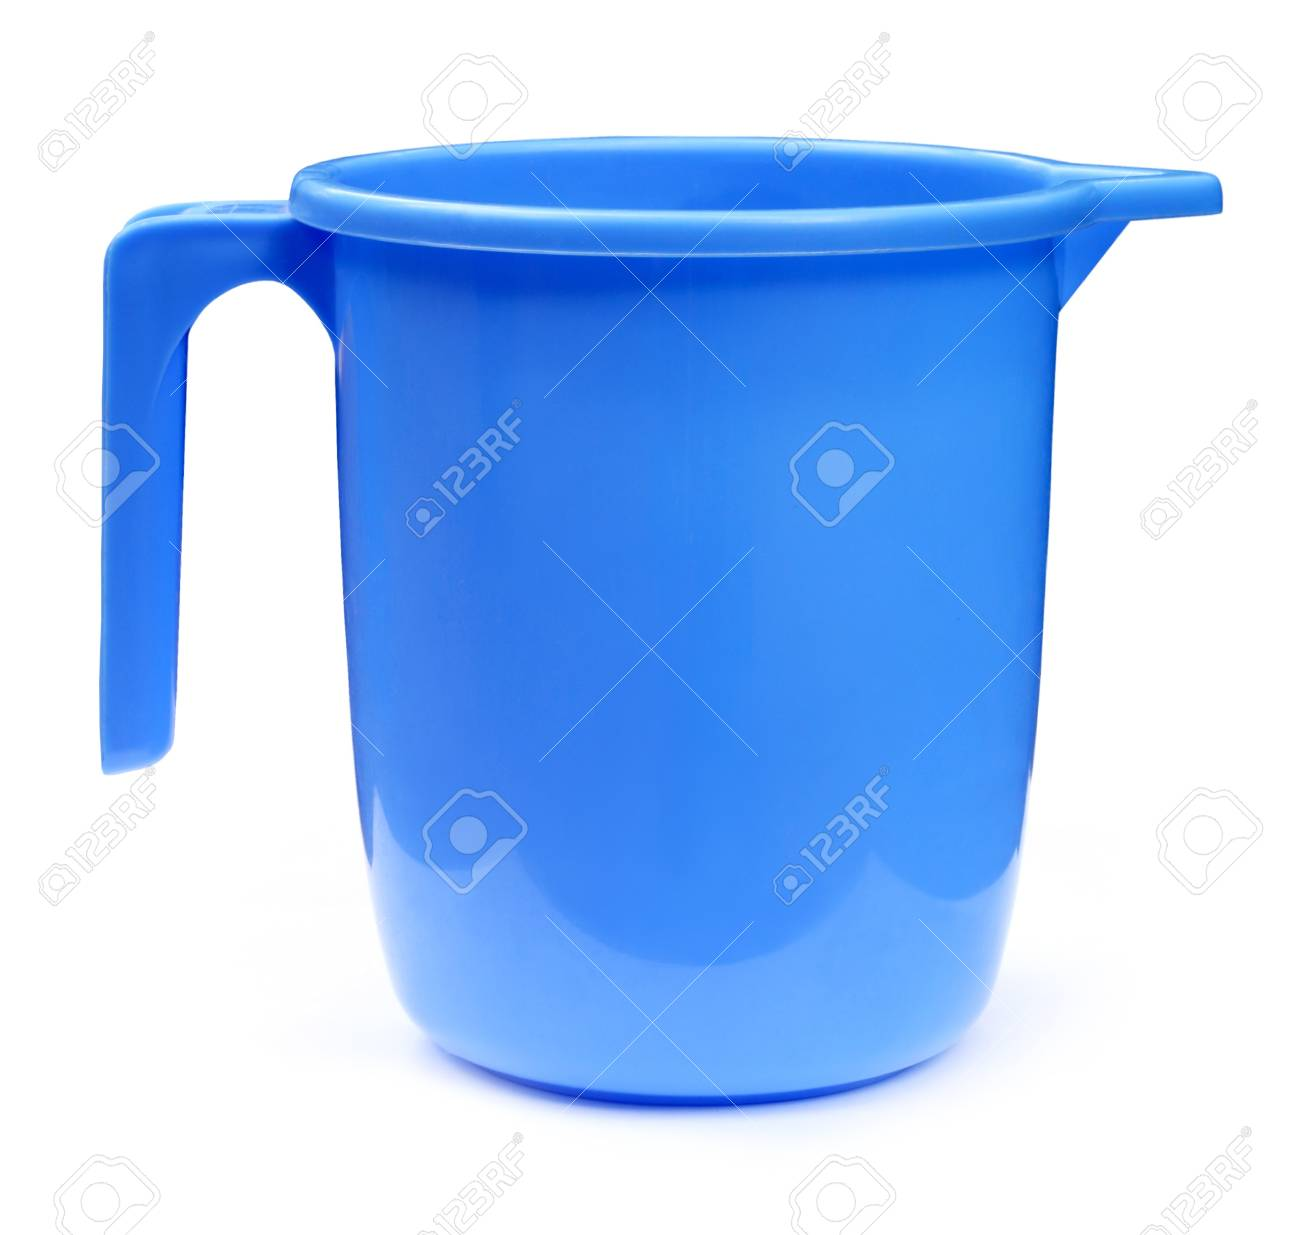 Plastic Bathroom Mug